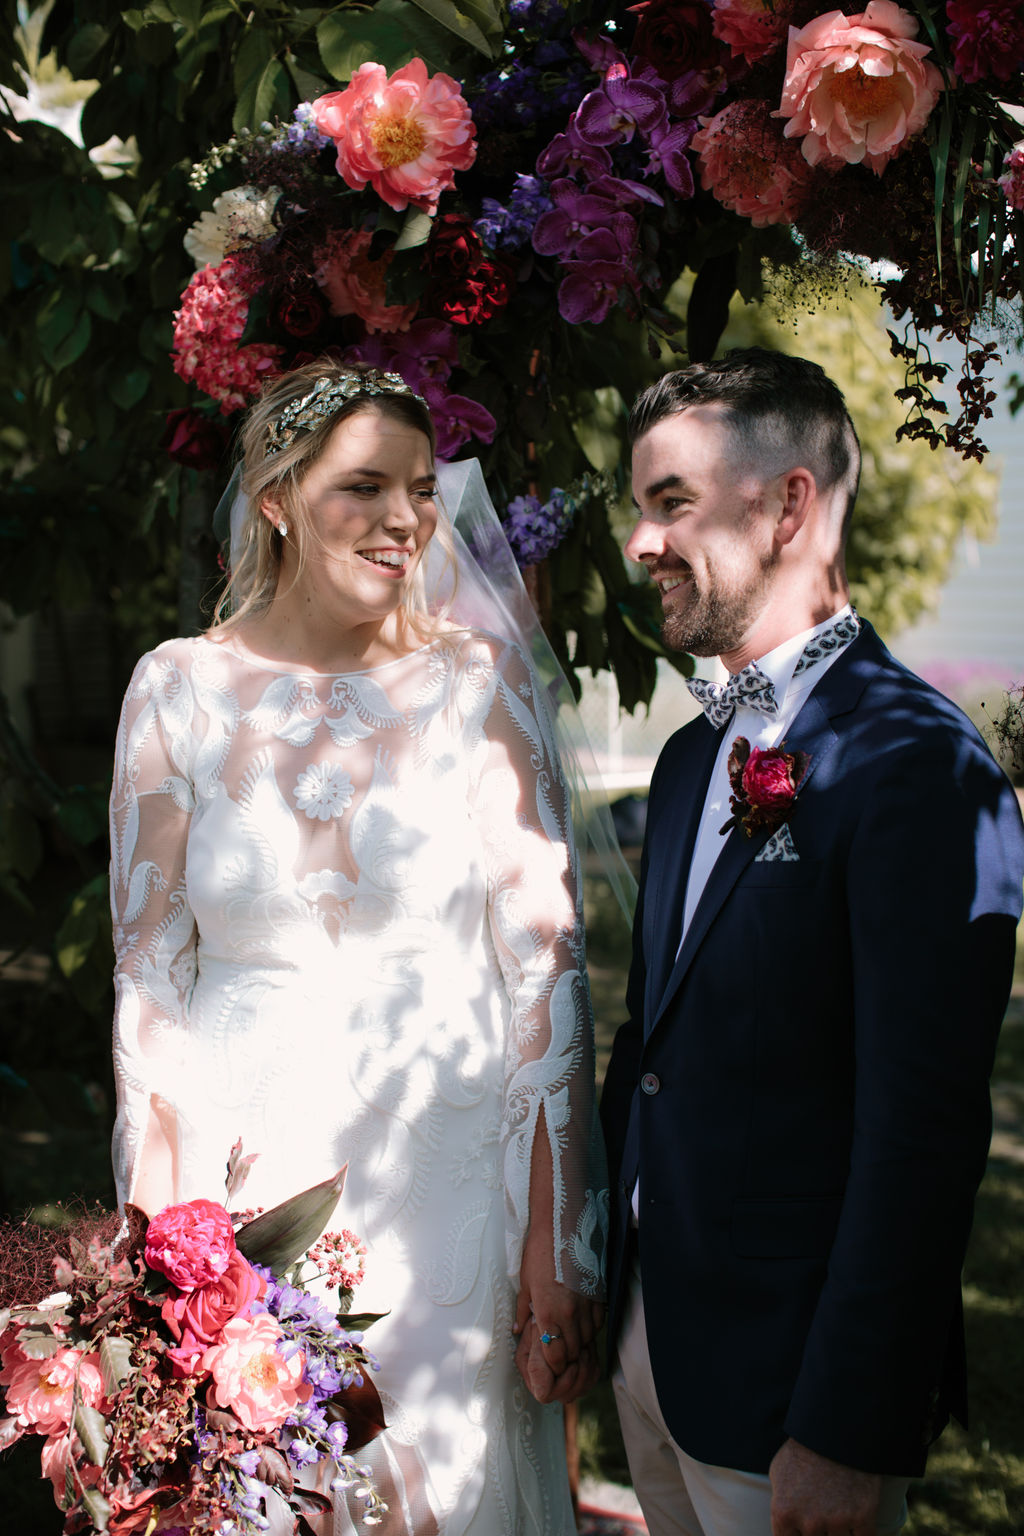 I-Got-You-Babe-Weddings-Erin-Dave440.JPG